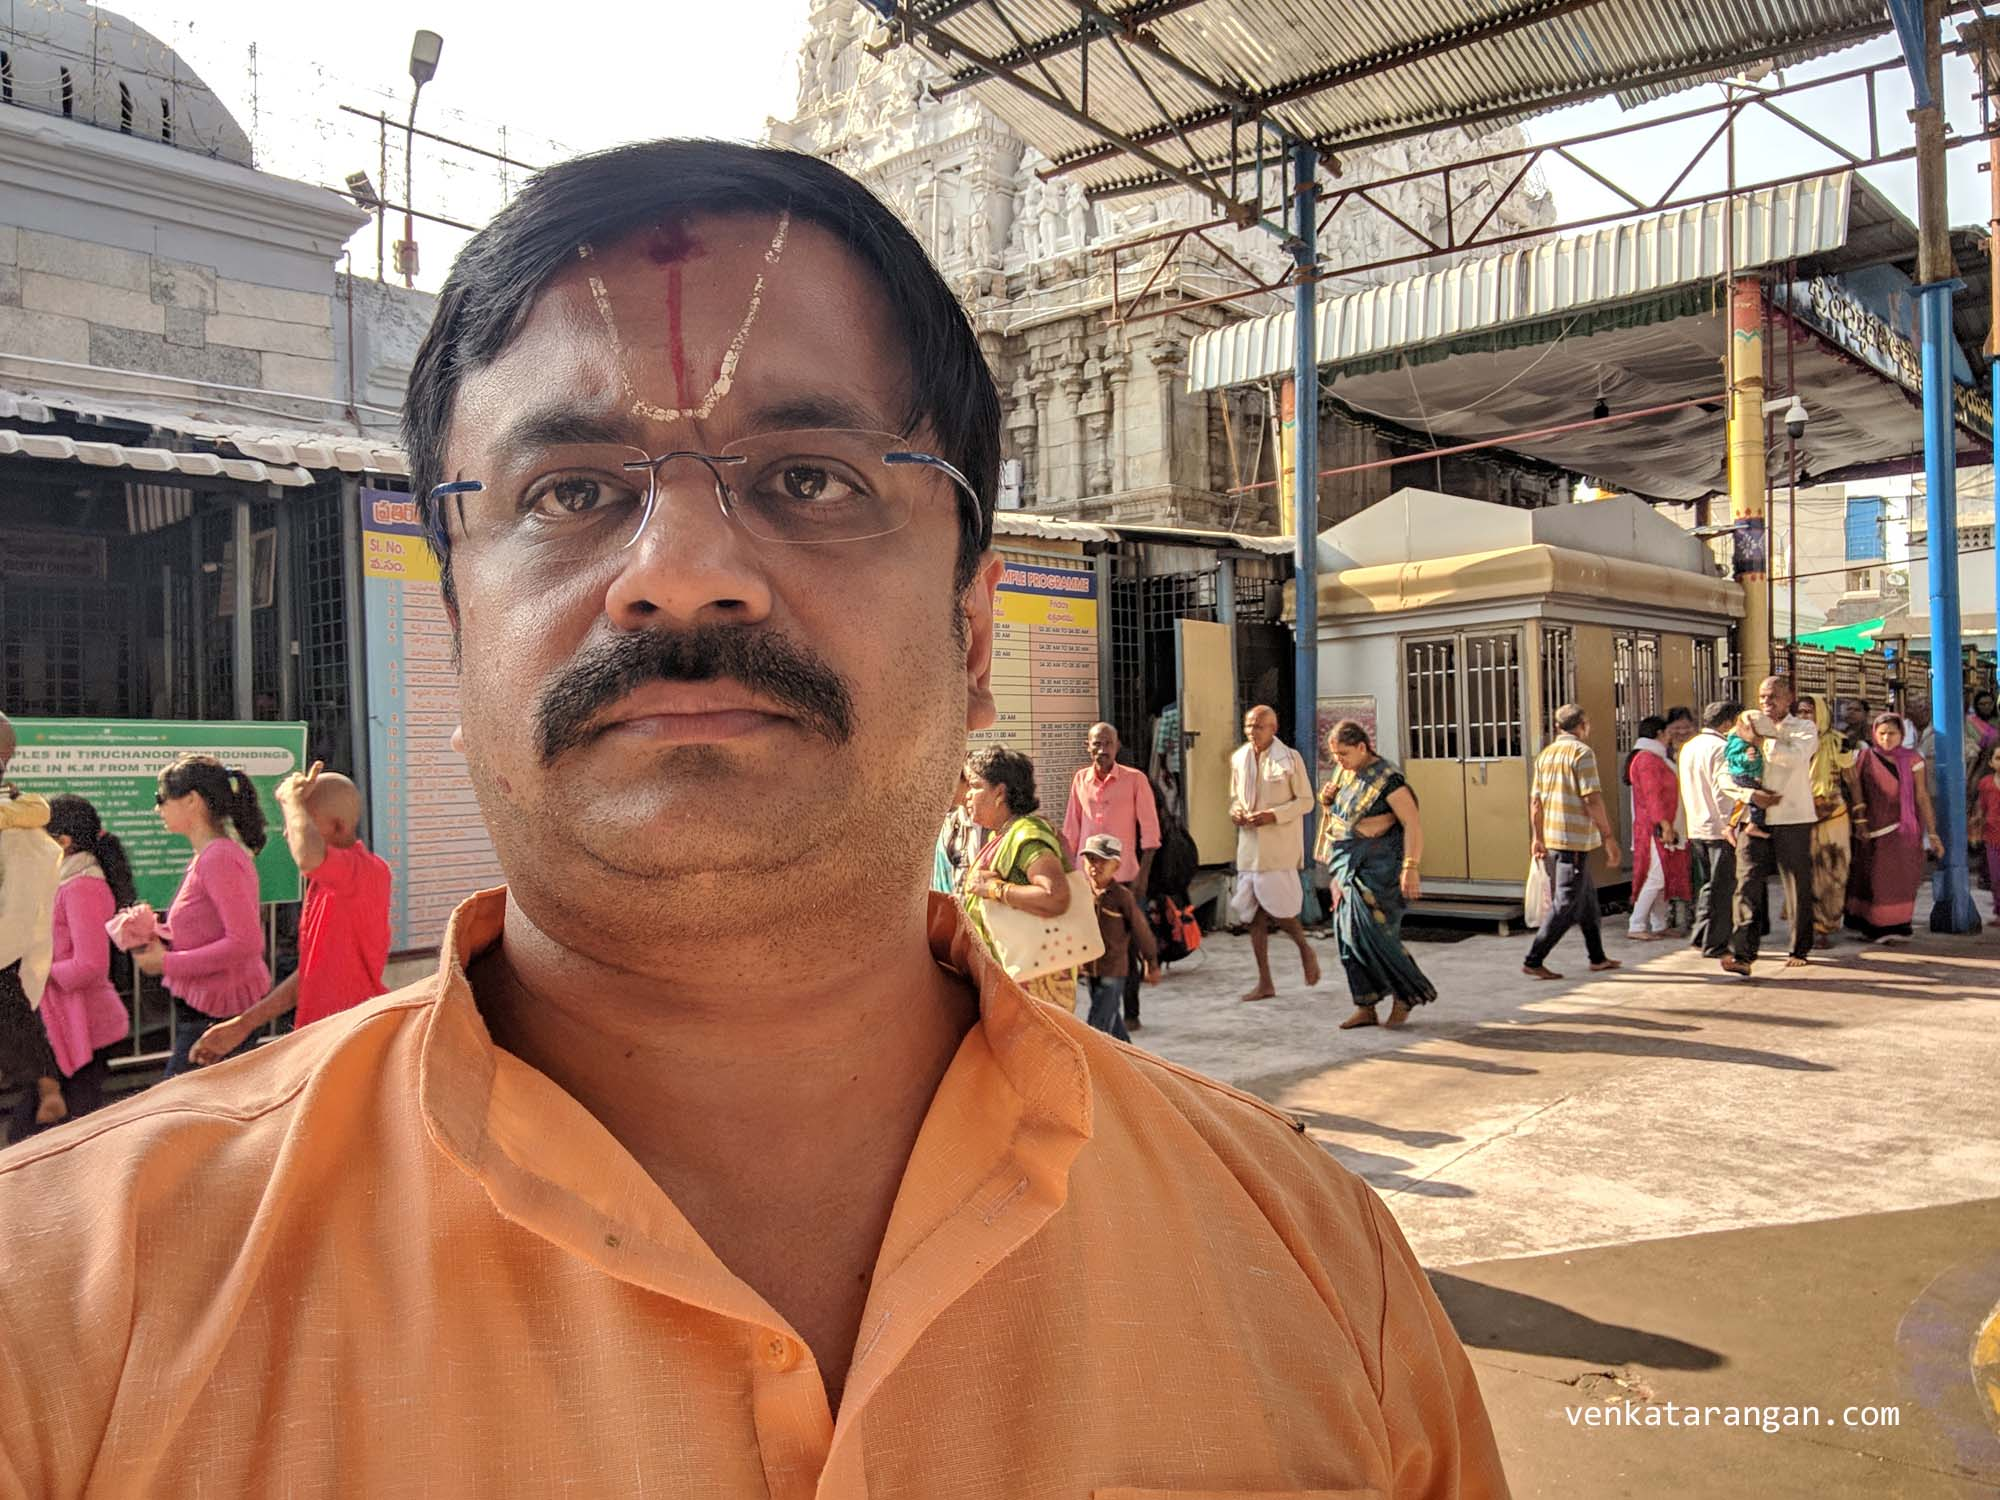 Before going for the darshan of Goddess Padmavathi Temple - திருச்சானூர் பத்மாவதி தாயார் கோவில்